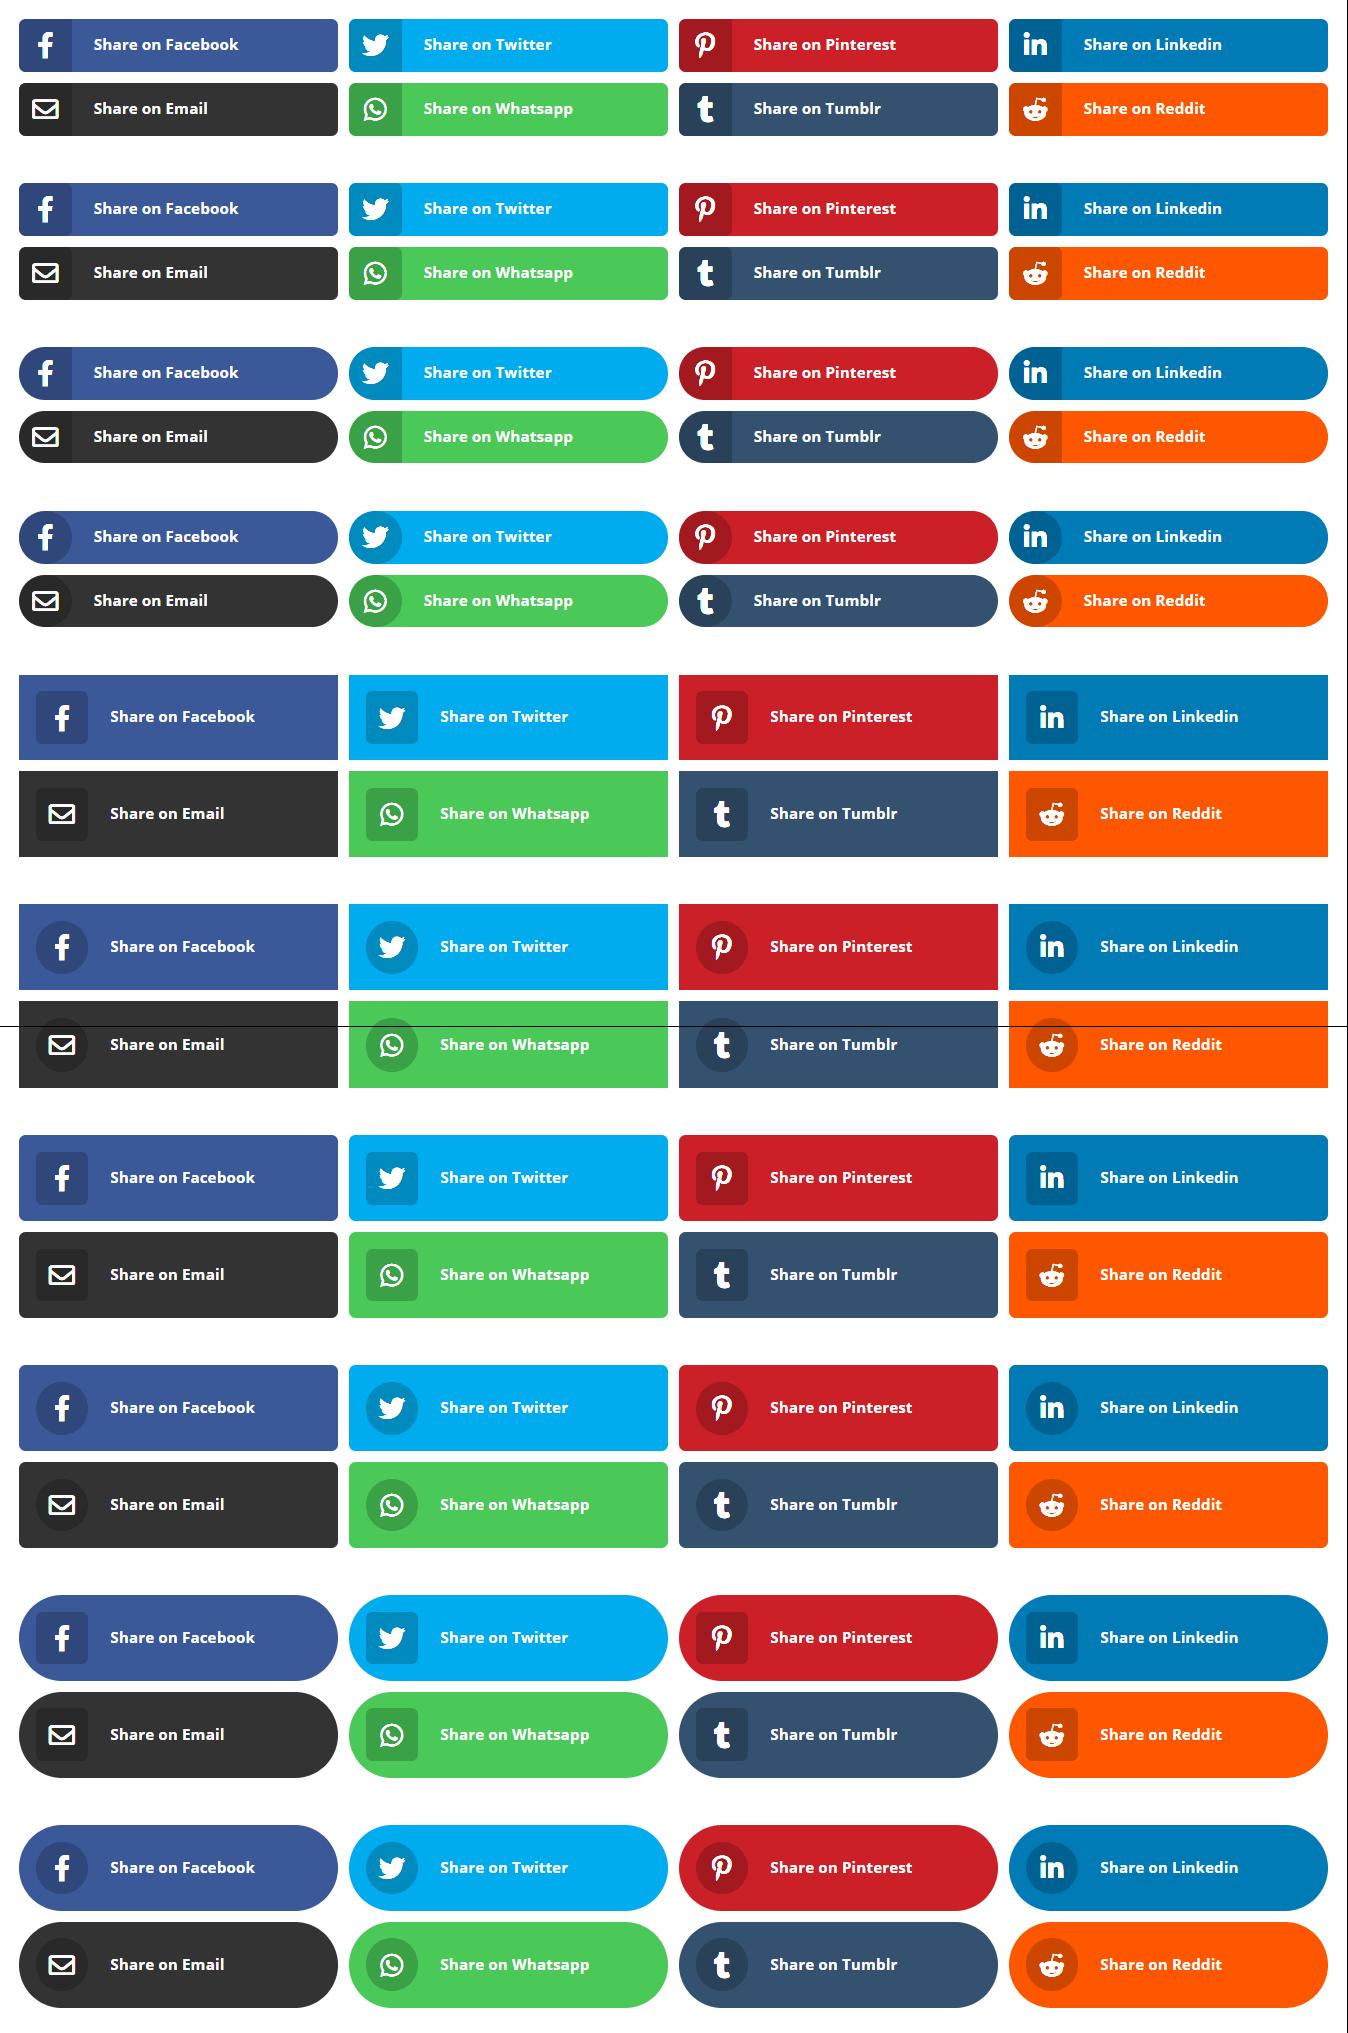 Divi Social Sharing Buttons Module Plugin by Pee Aye Creative 1